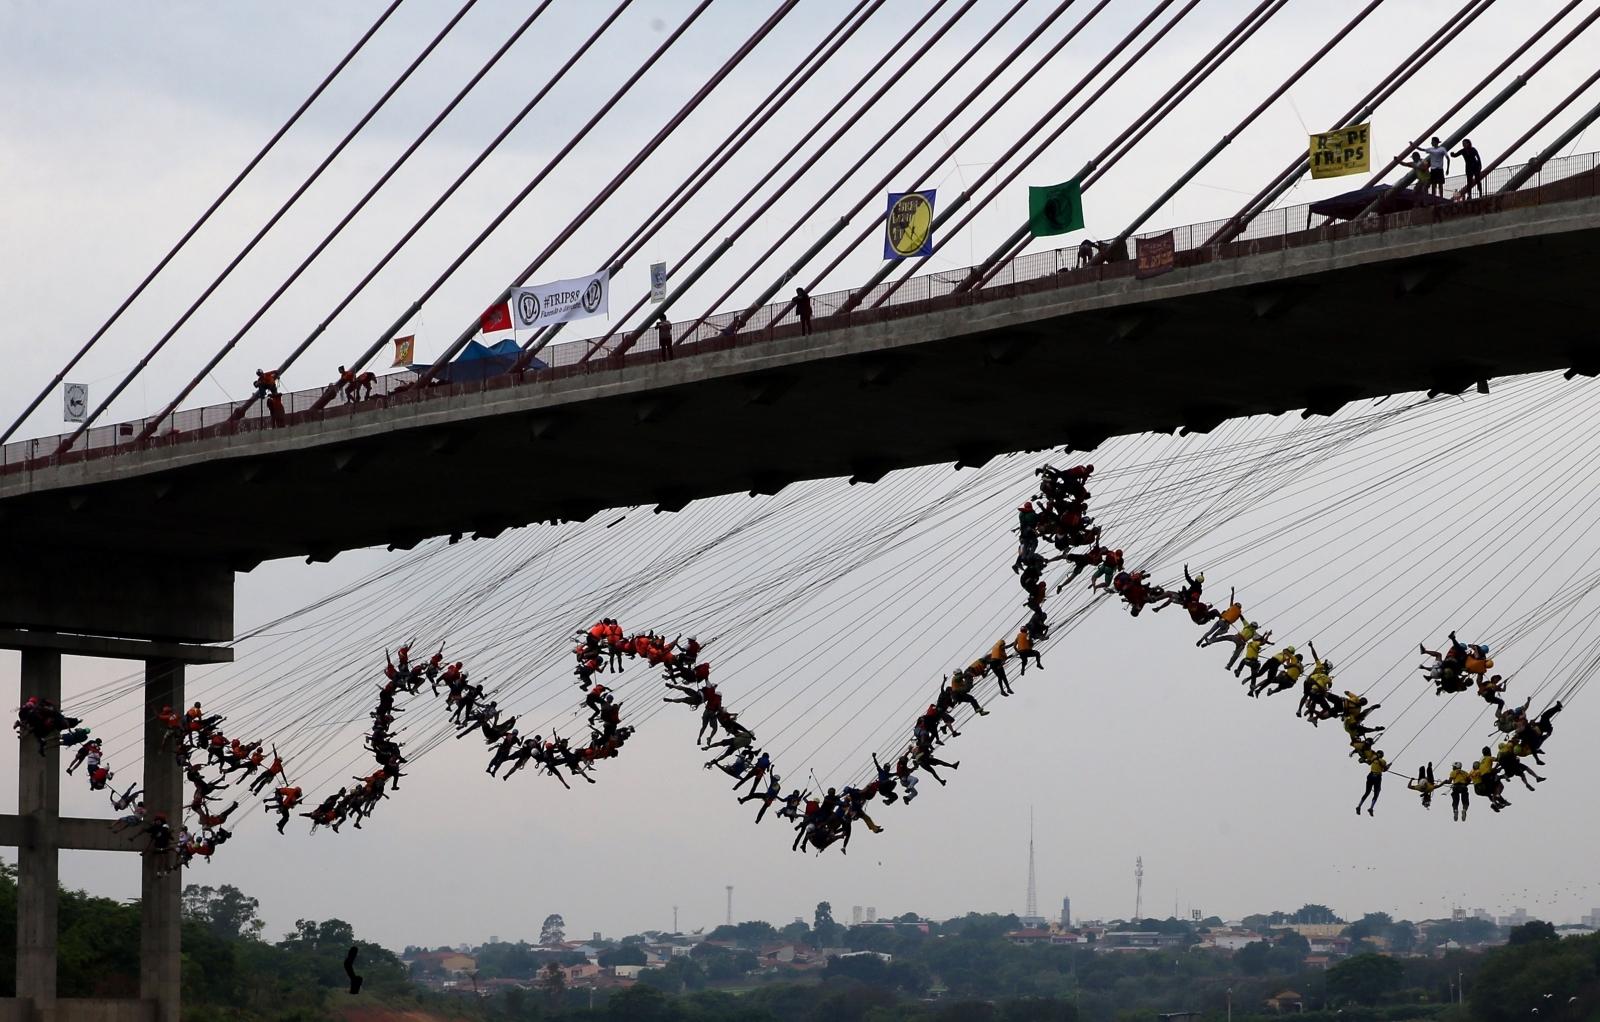 Bungee jump in Brazil